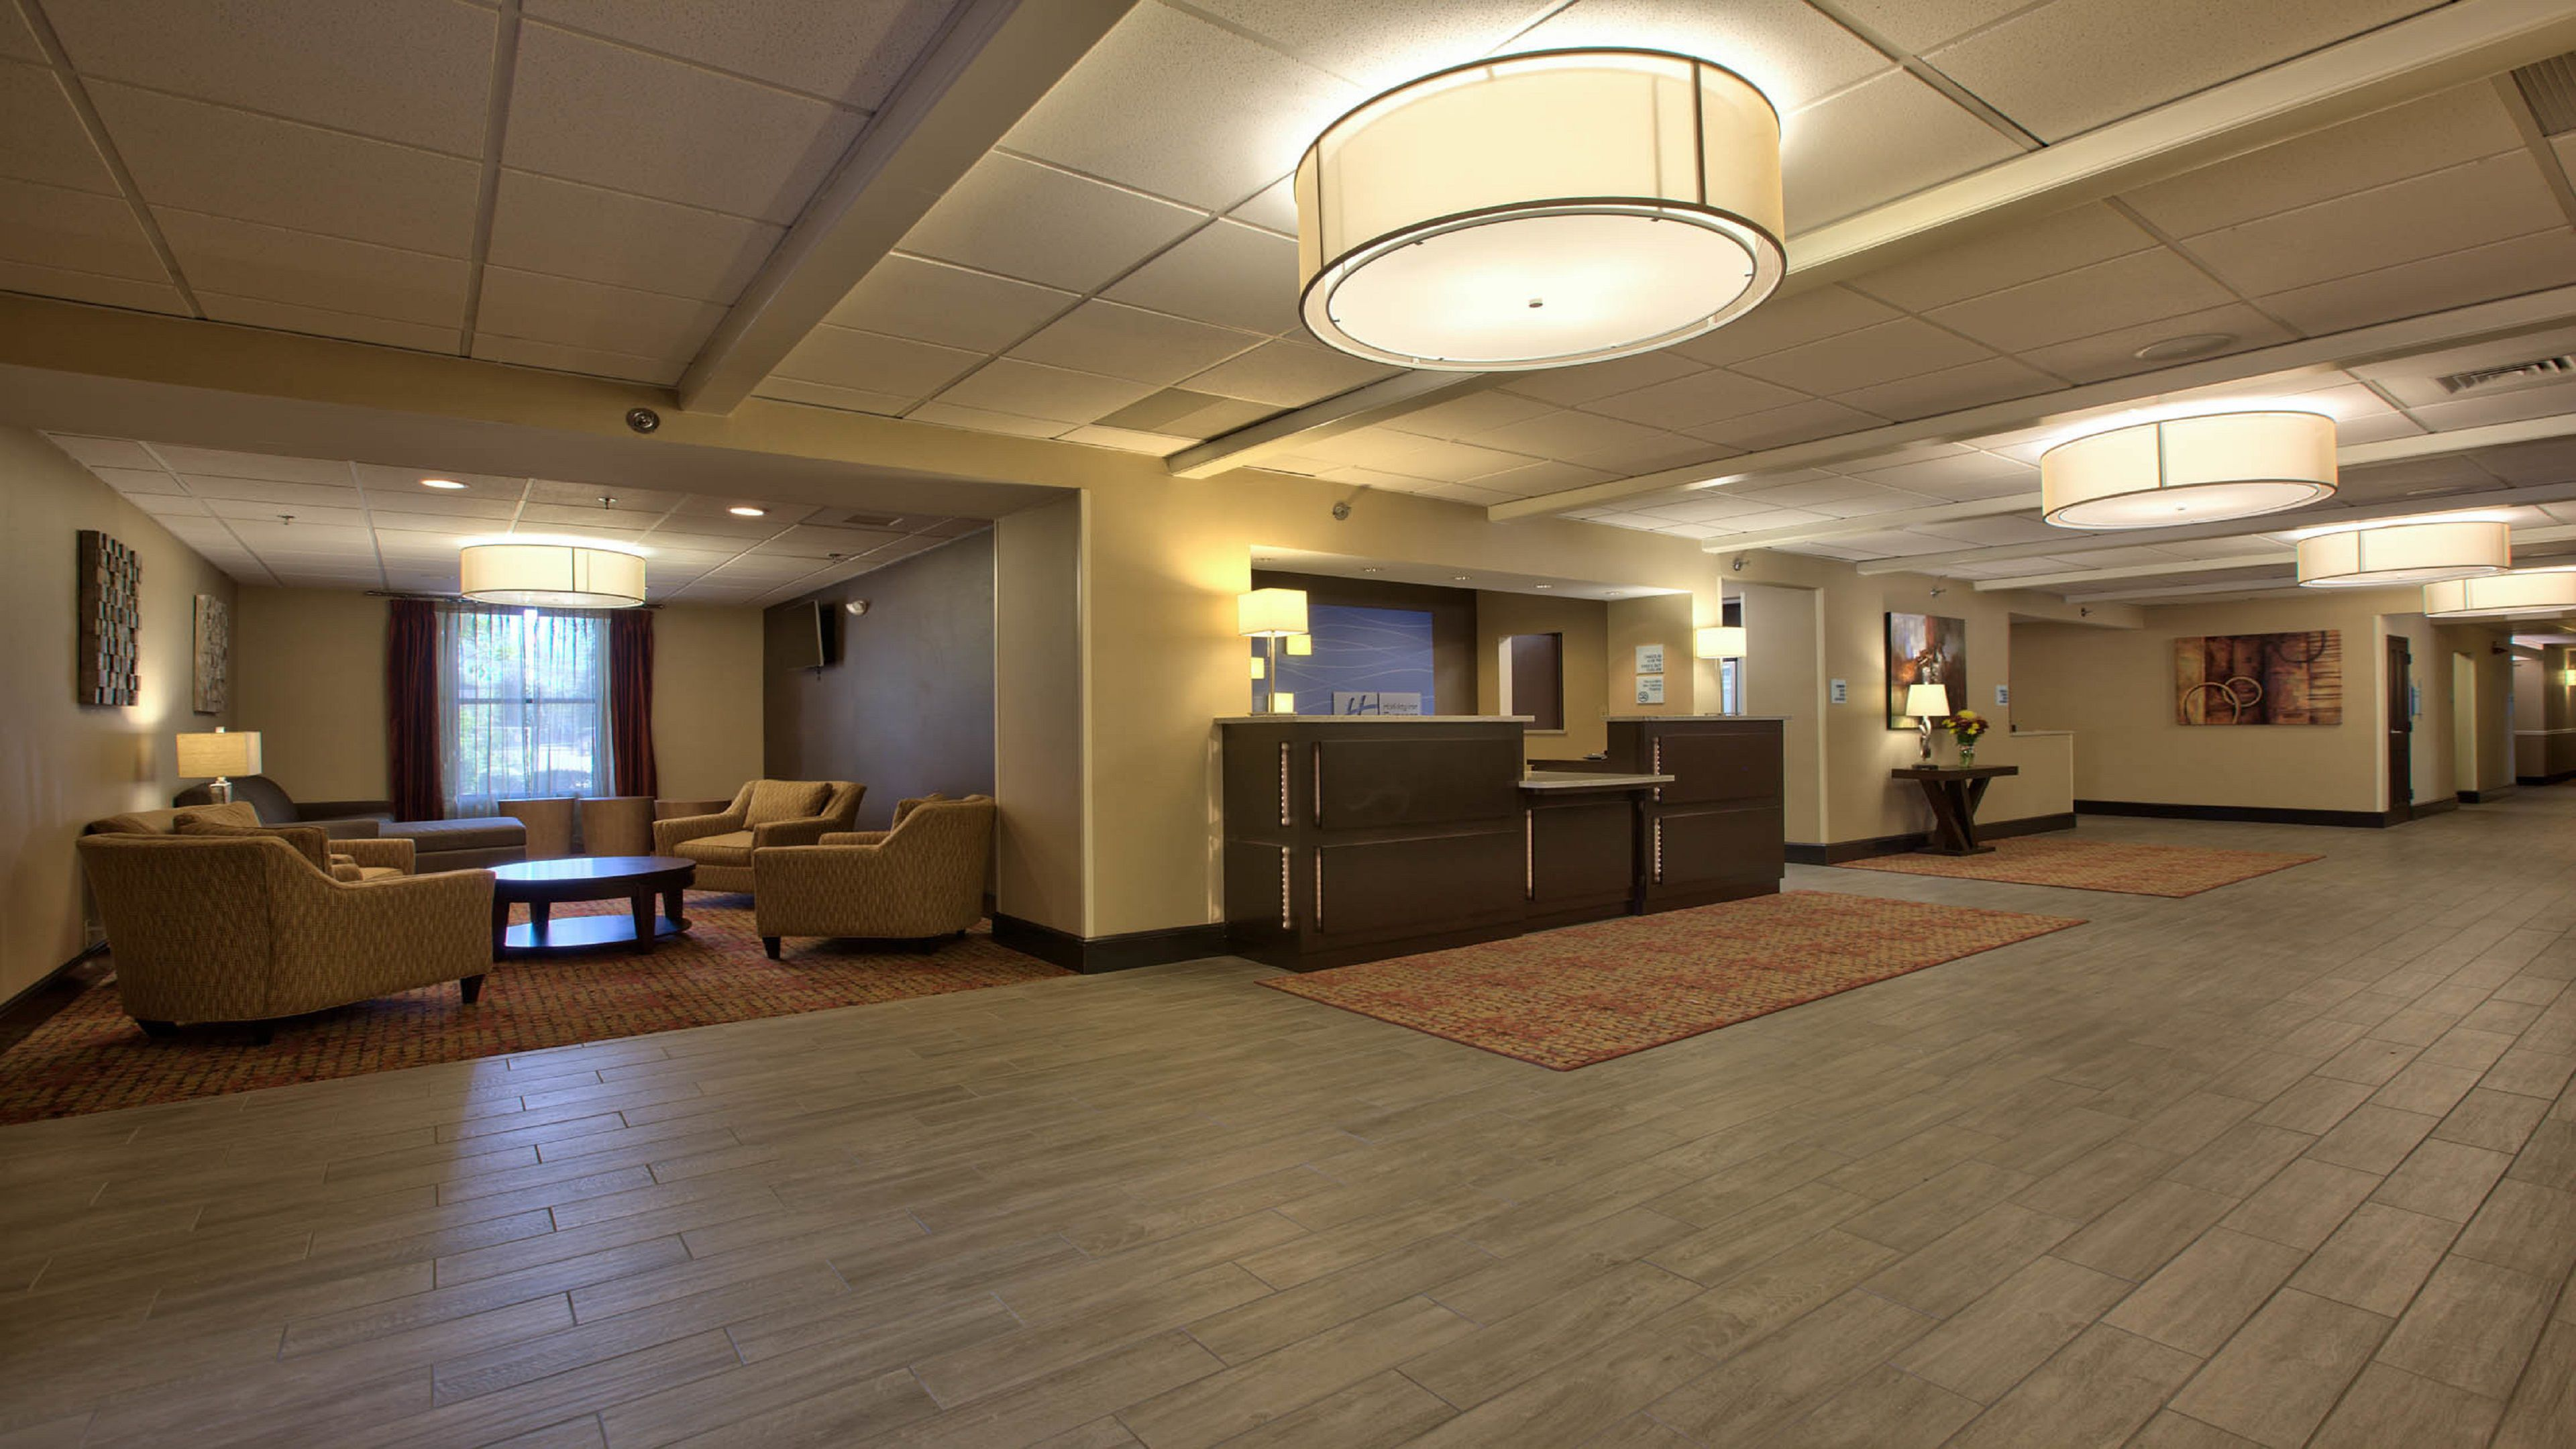 Holiday Inn Express Tallahassee - I-10 E image 3